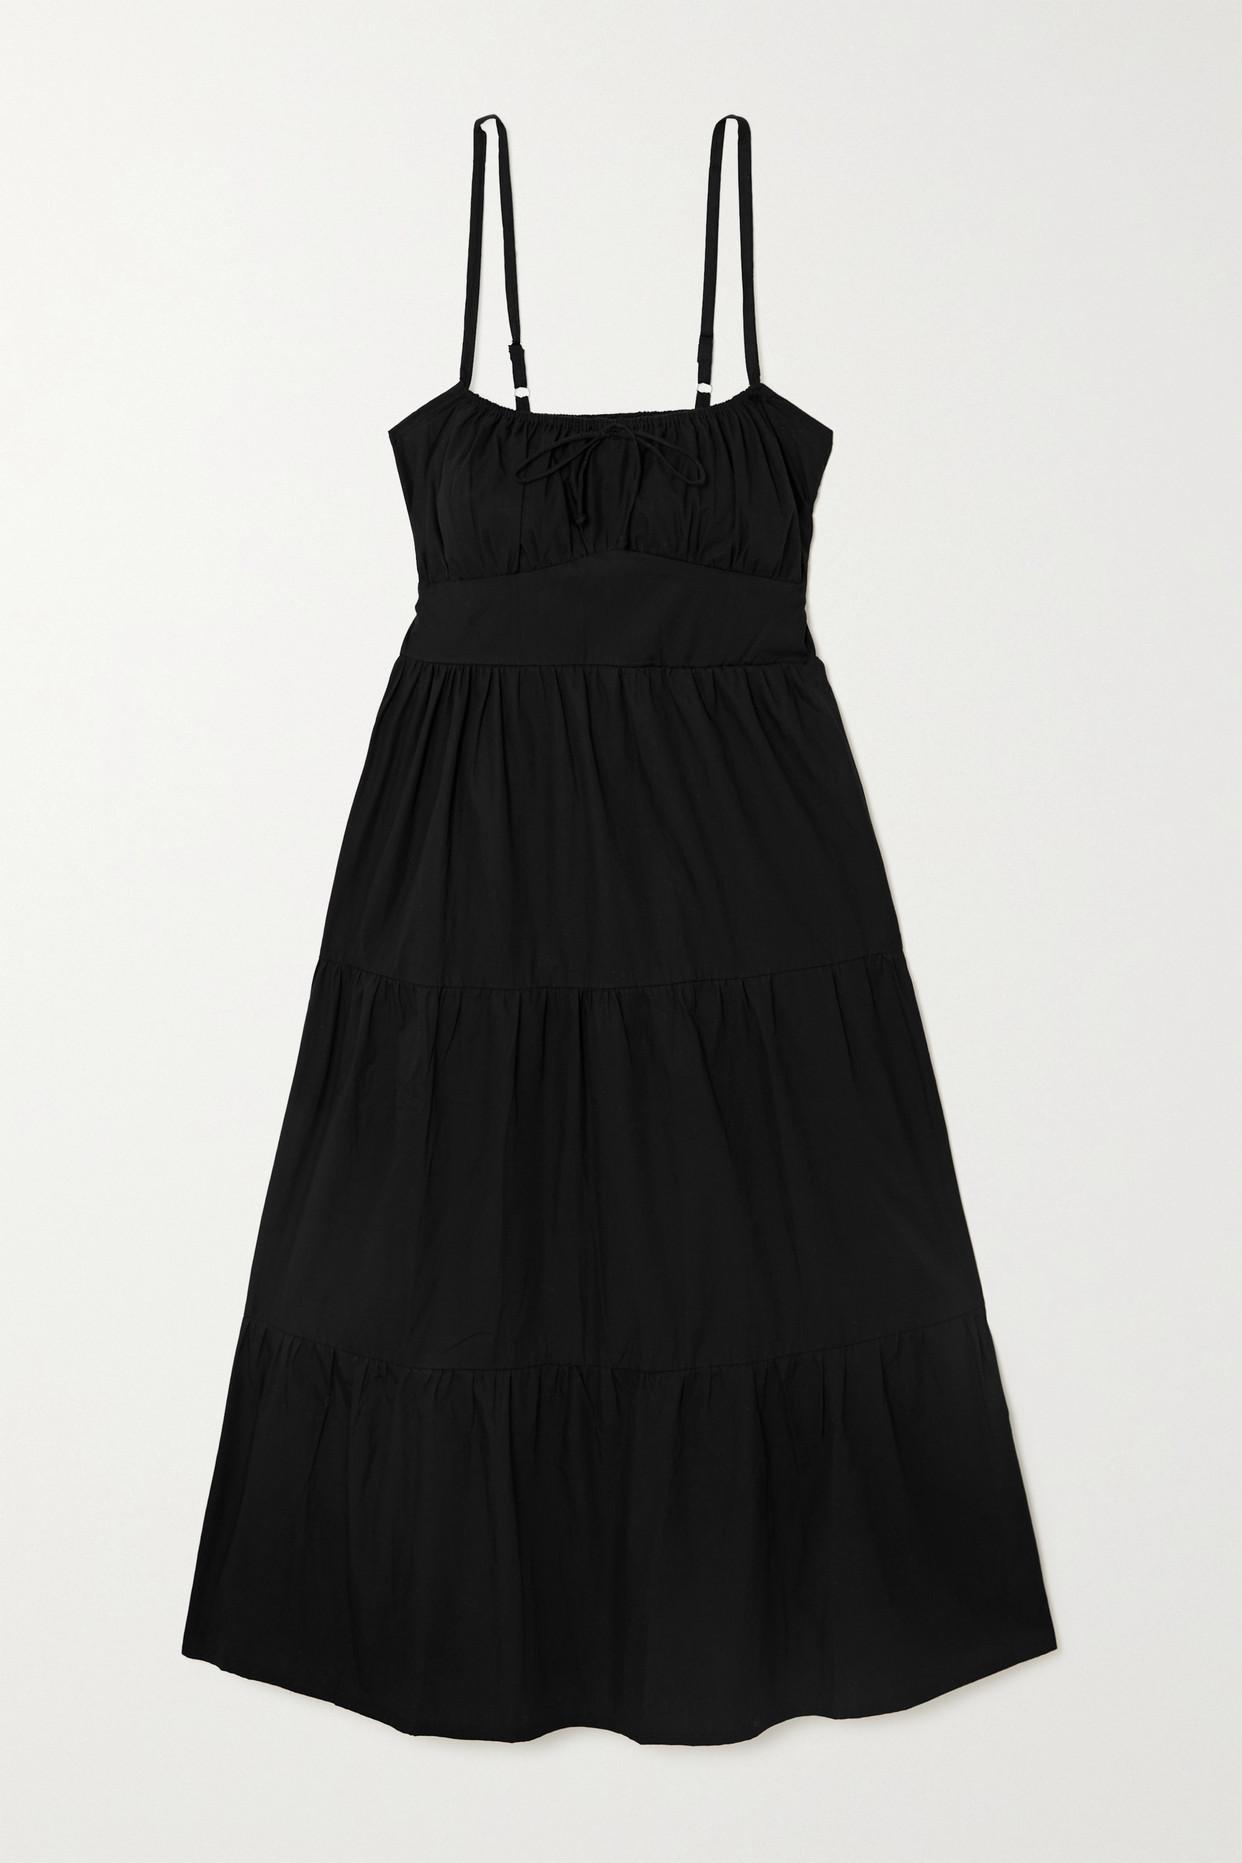 FAITHFULL THE BRAND - + Net Sustain Alexia Leopard-print Gathered Cotton-poplin Midi Dress - Black -